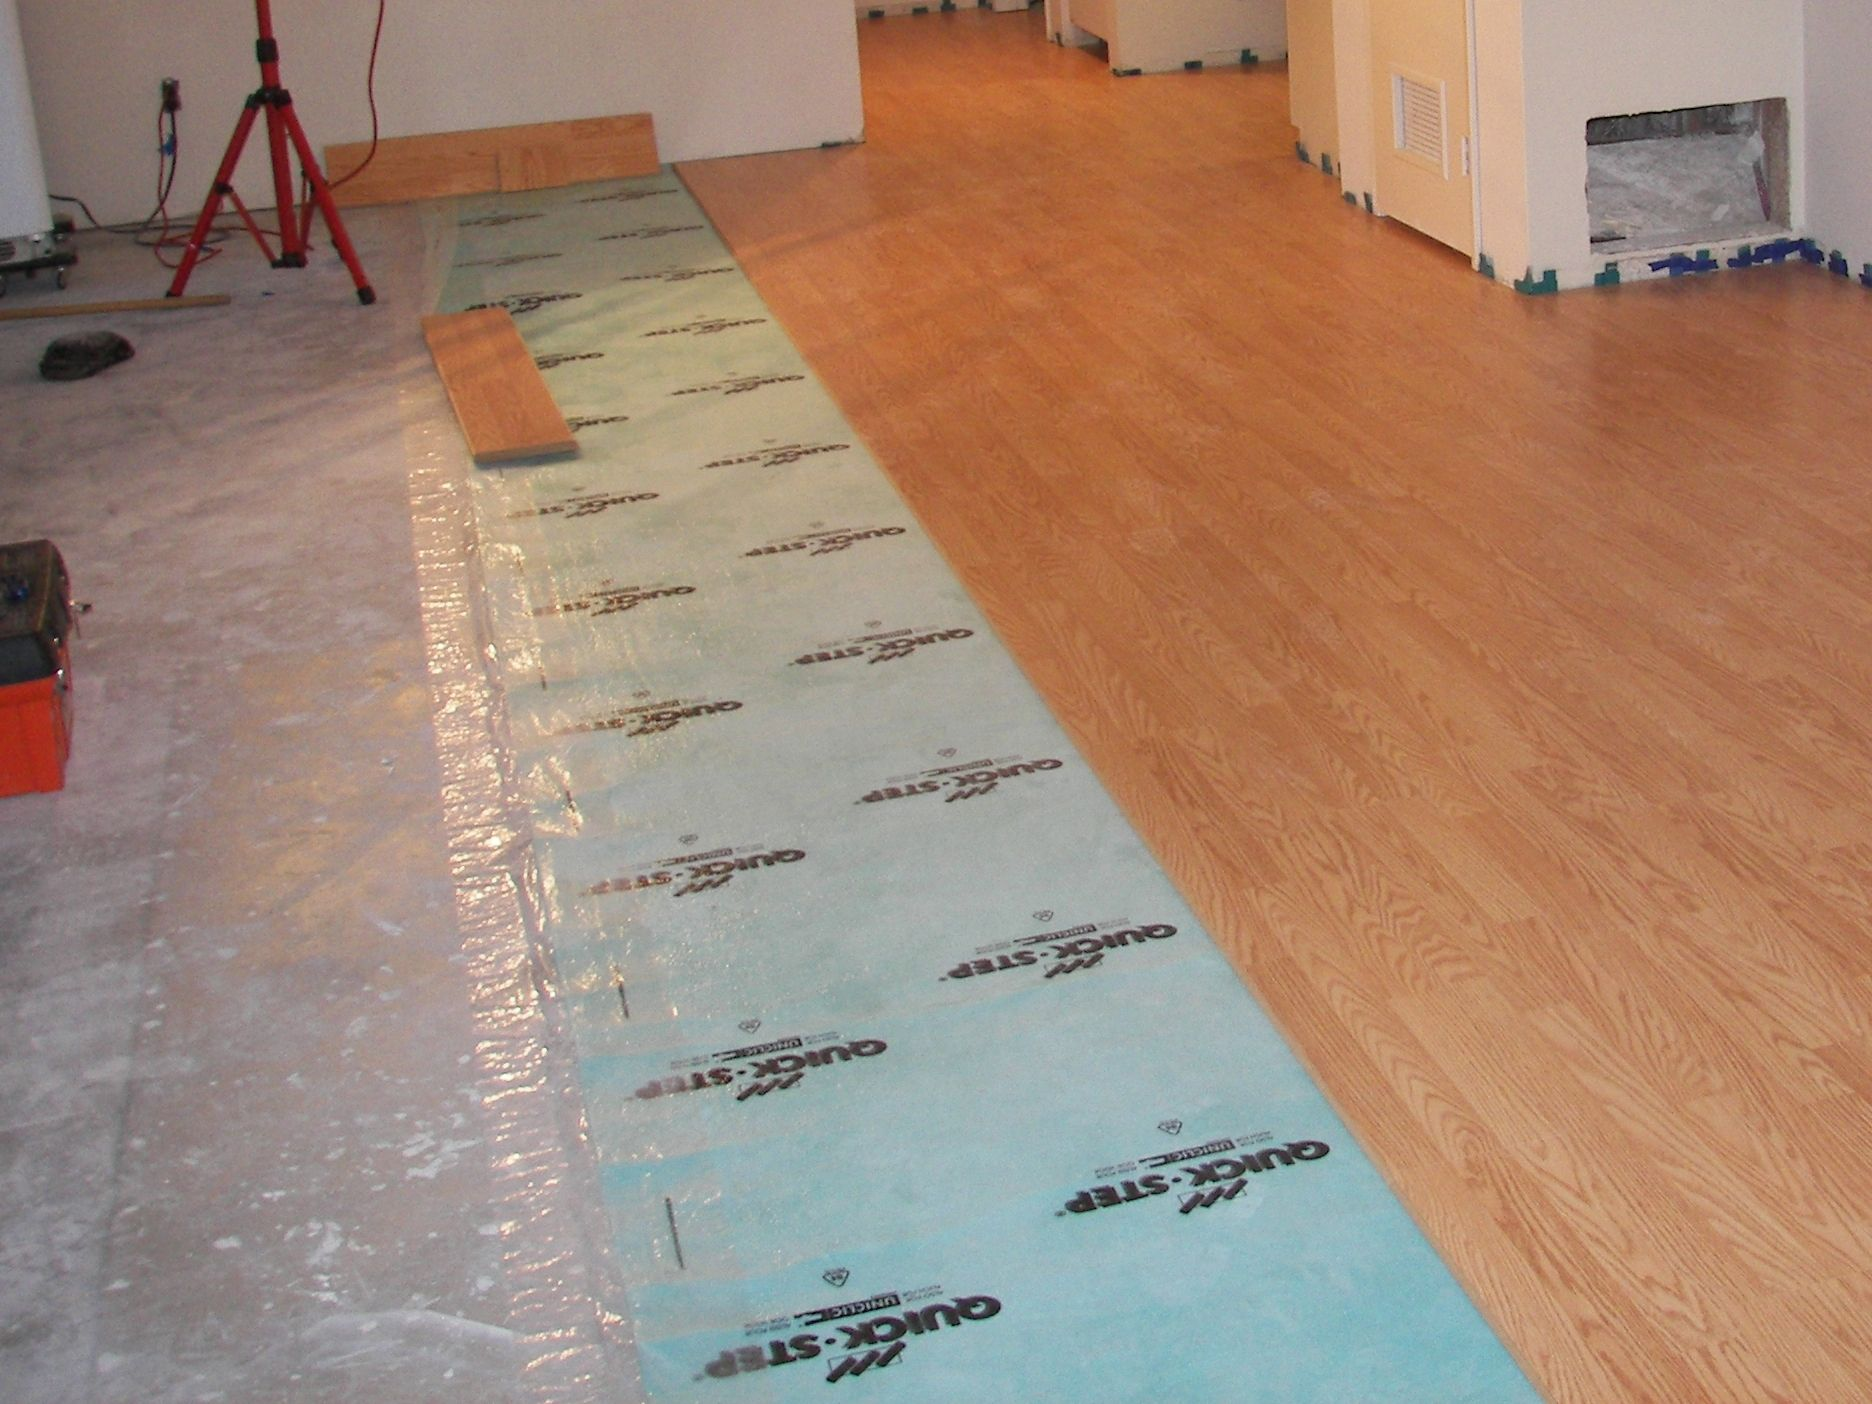 Underlayment For Hardwood Floors On Wood Subfloor